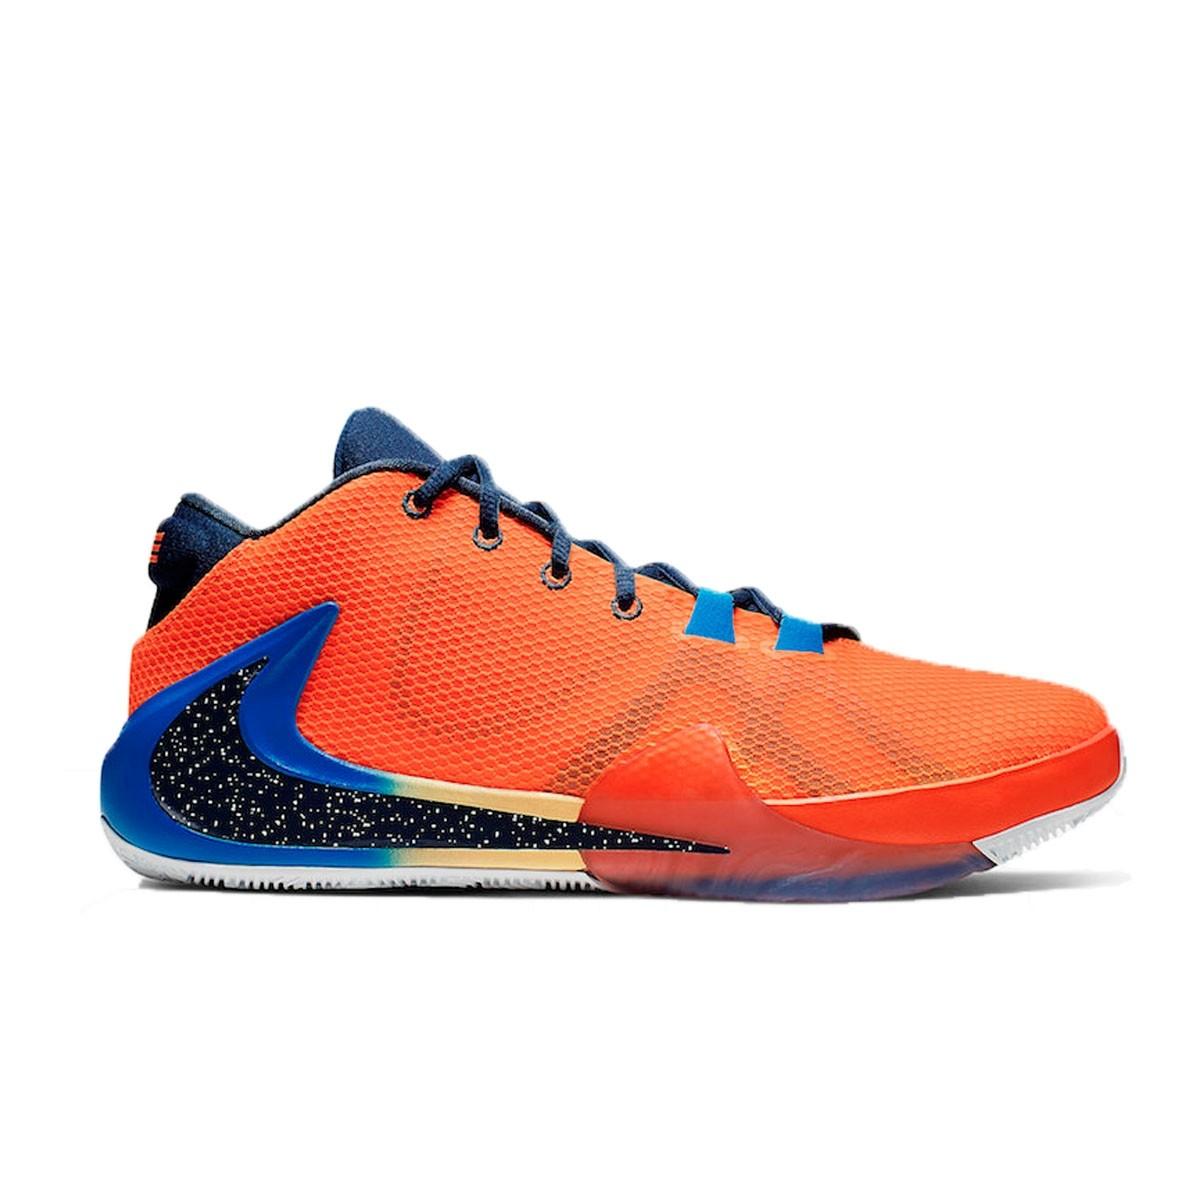 Nike Zoom Freak 1 'Antetokounbros'